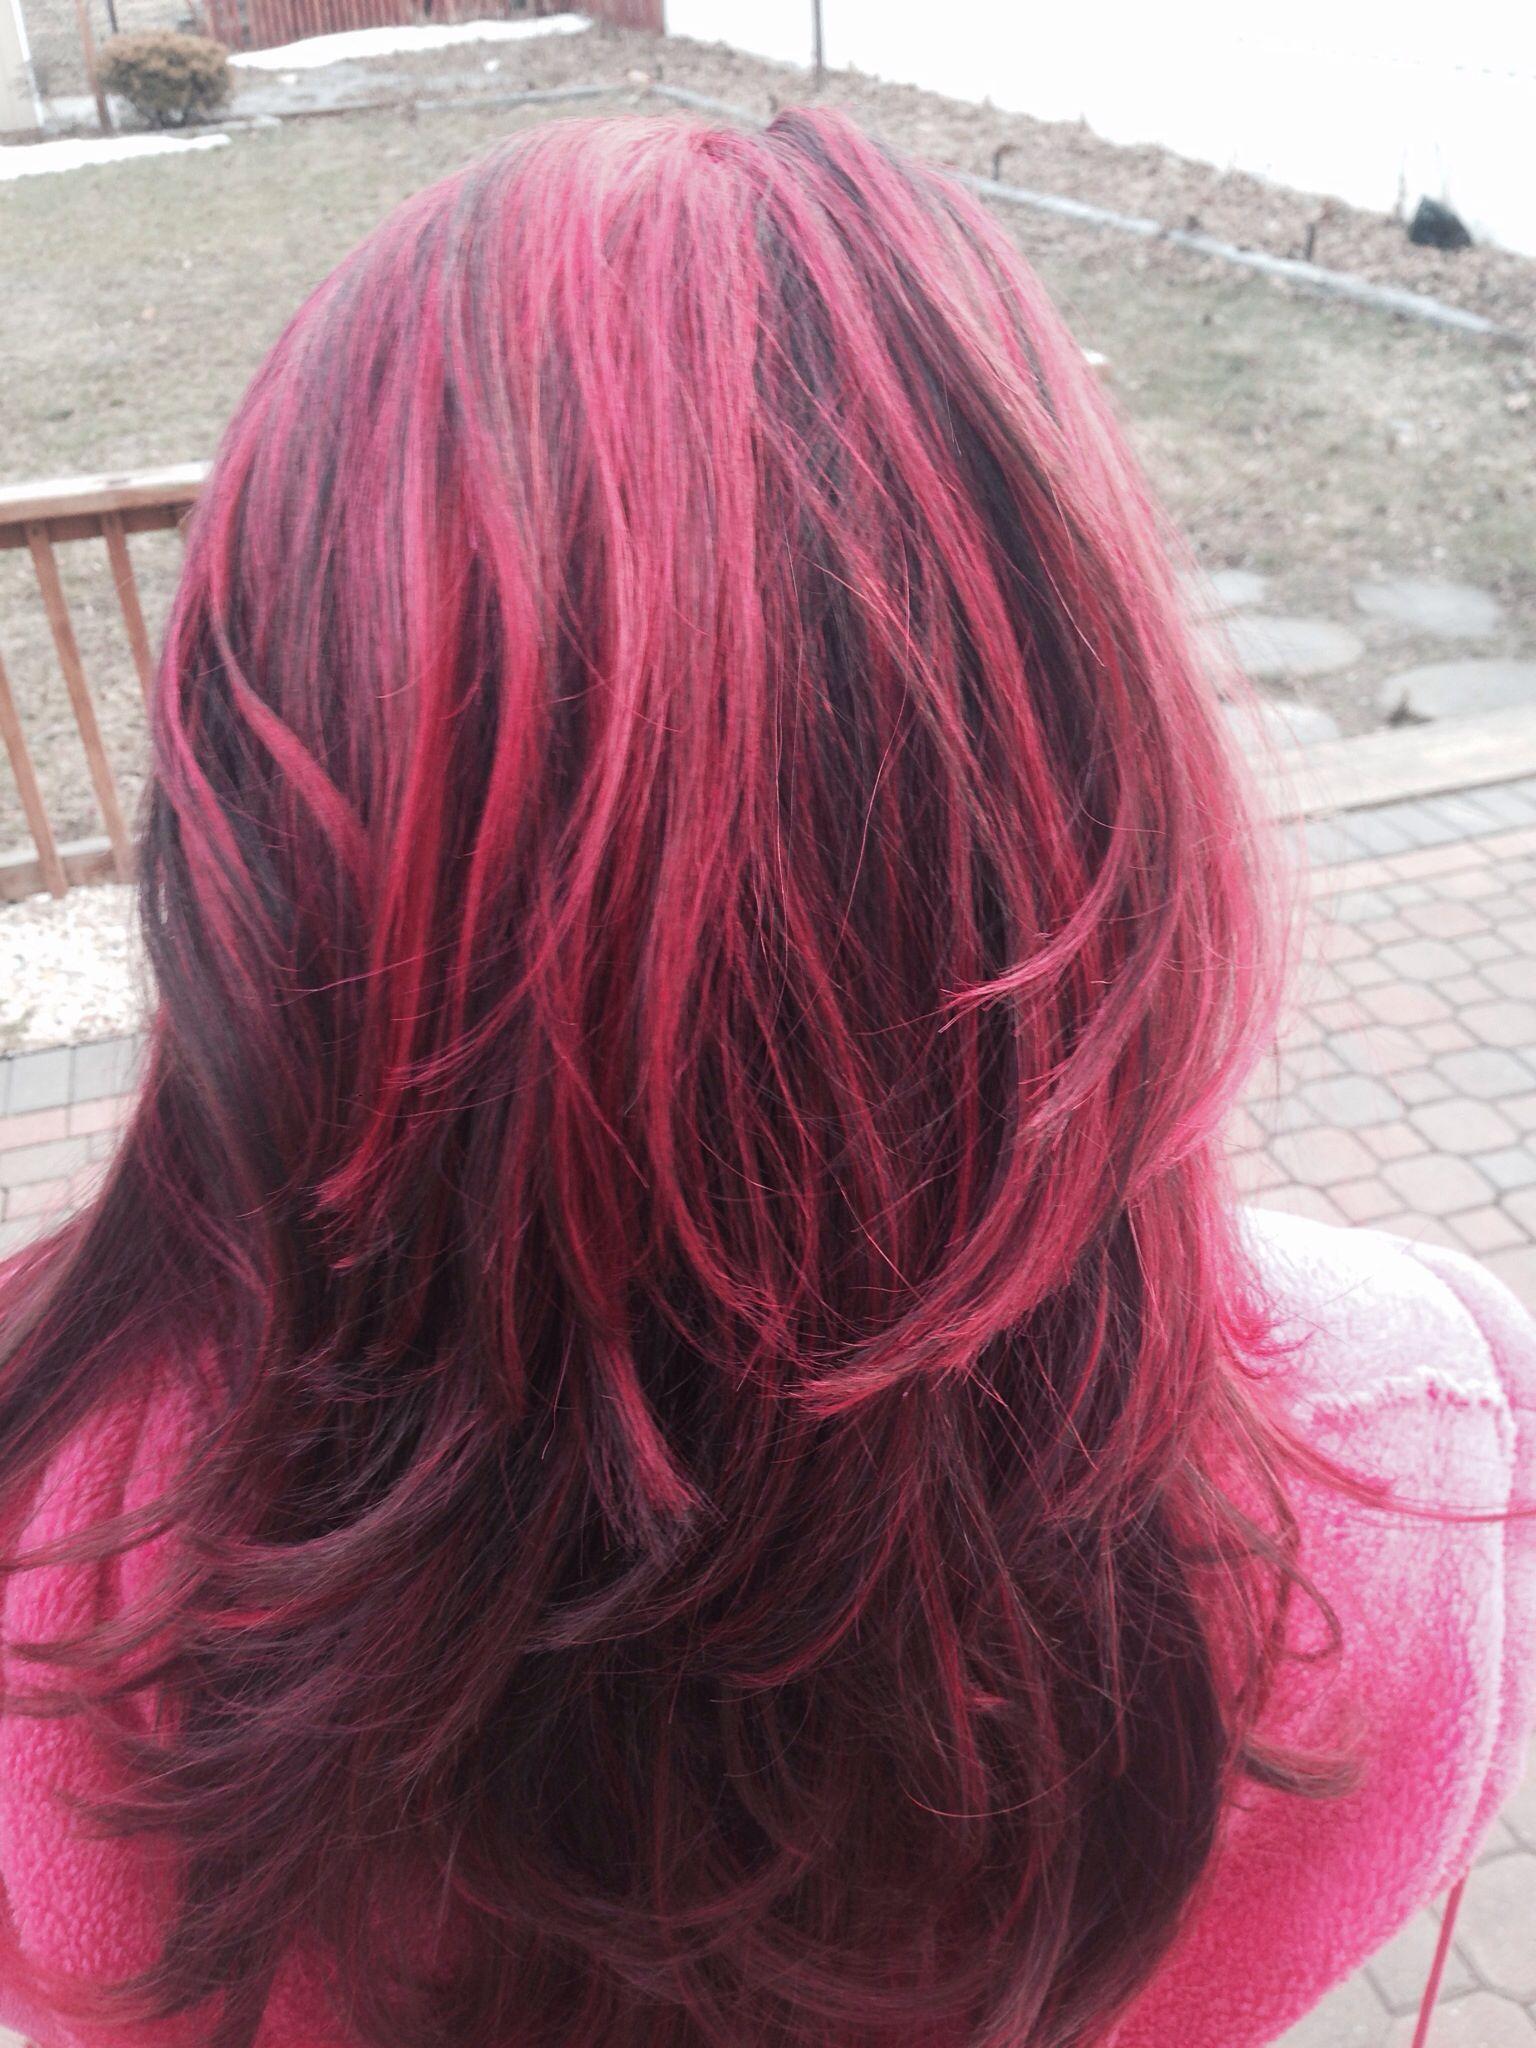 Pink Highlights on brown hair Hair Pinterest